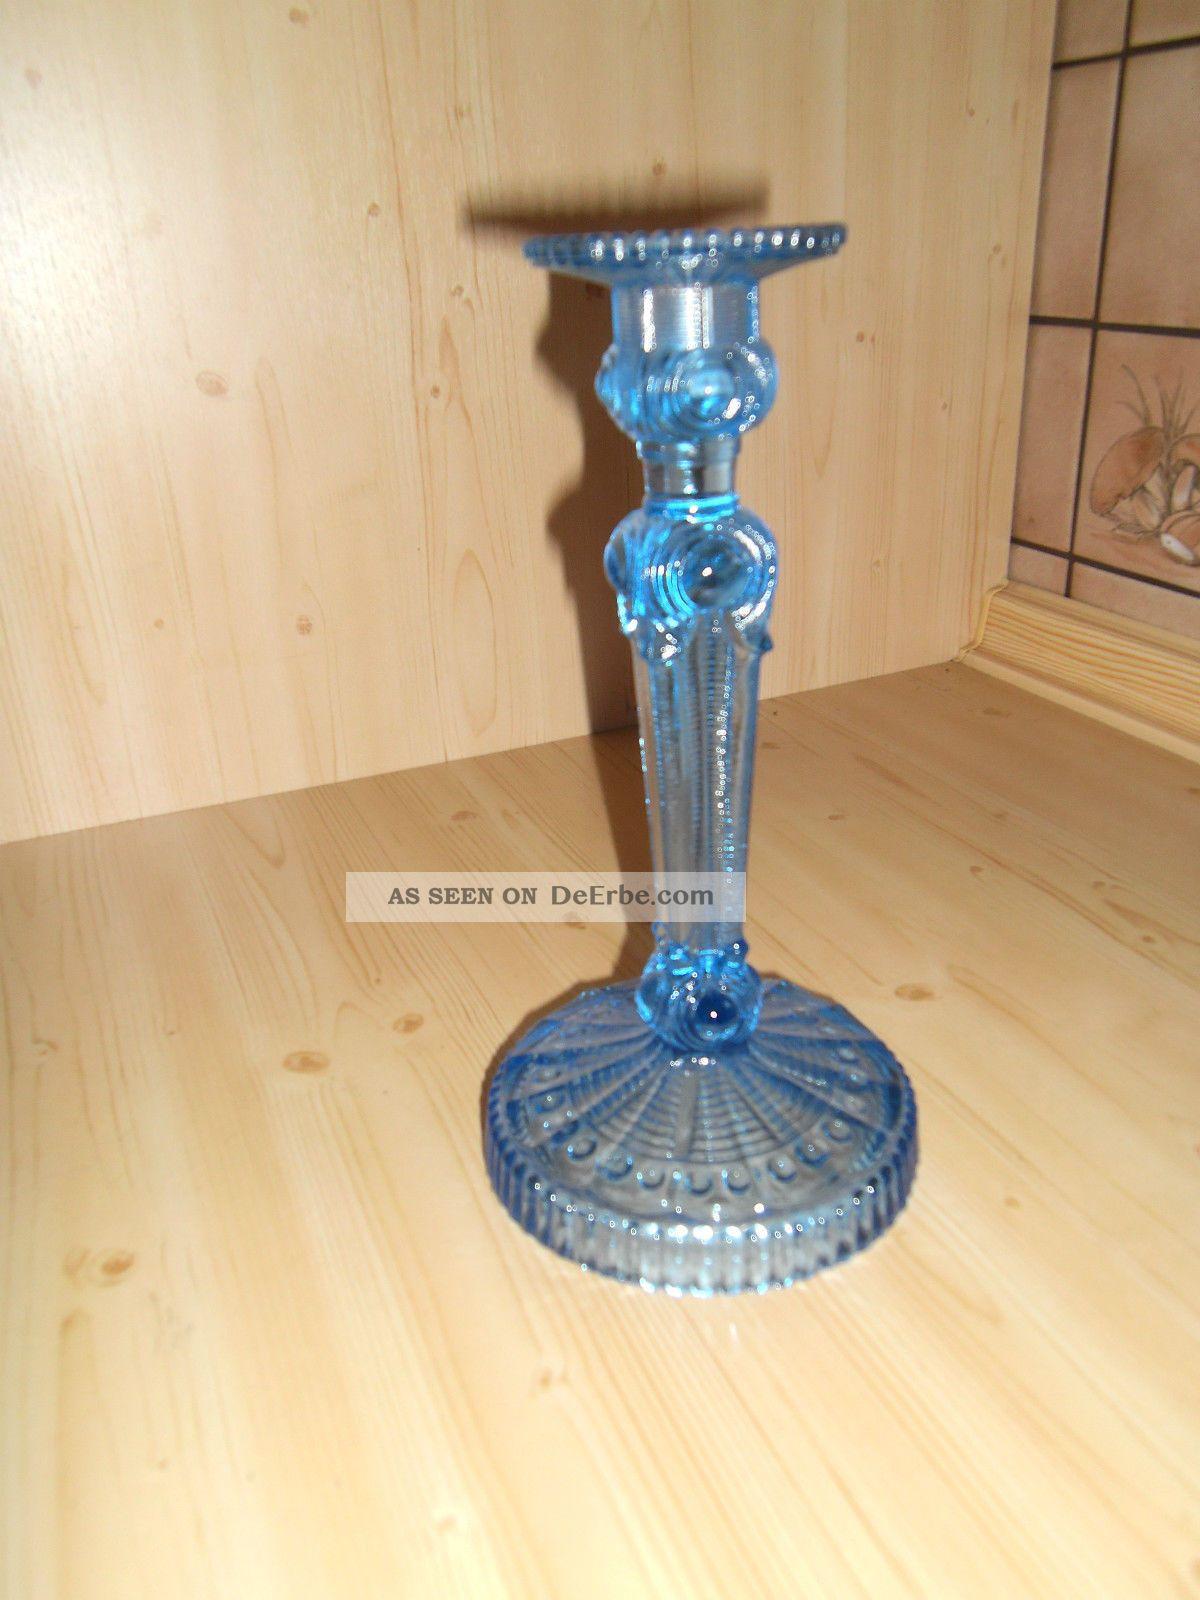 1 Antiker Kerzenständer,  Kerzenhalter,  Kerzenleuchter Pressglas Blau Top Zust. Kristall Bild